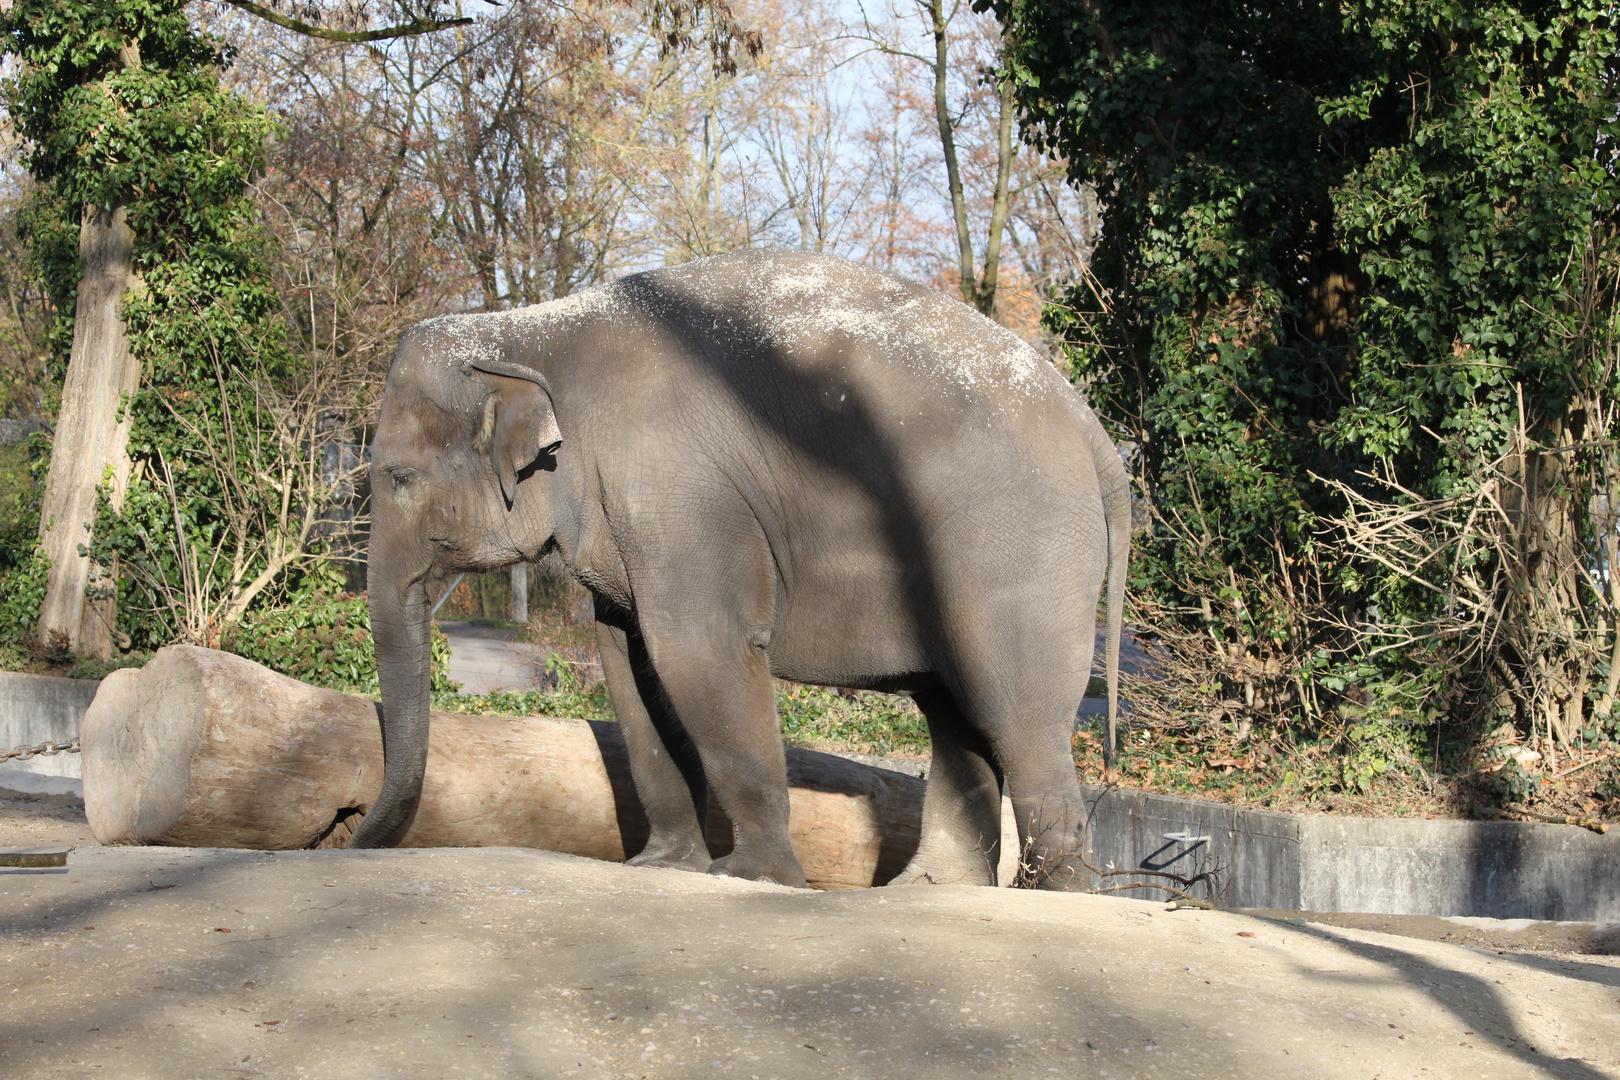 Elefant - Gediegene Langeweile